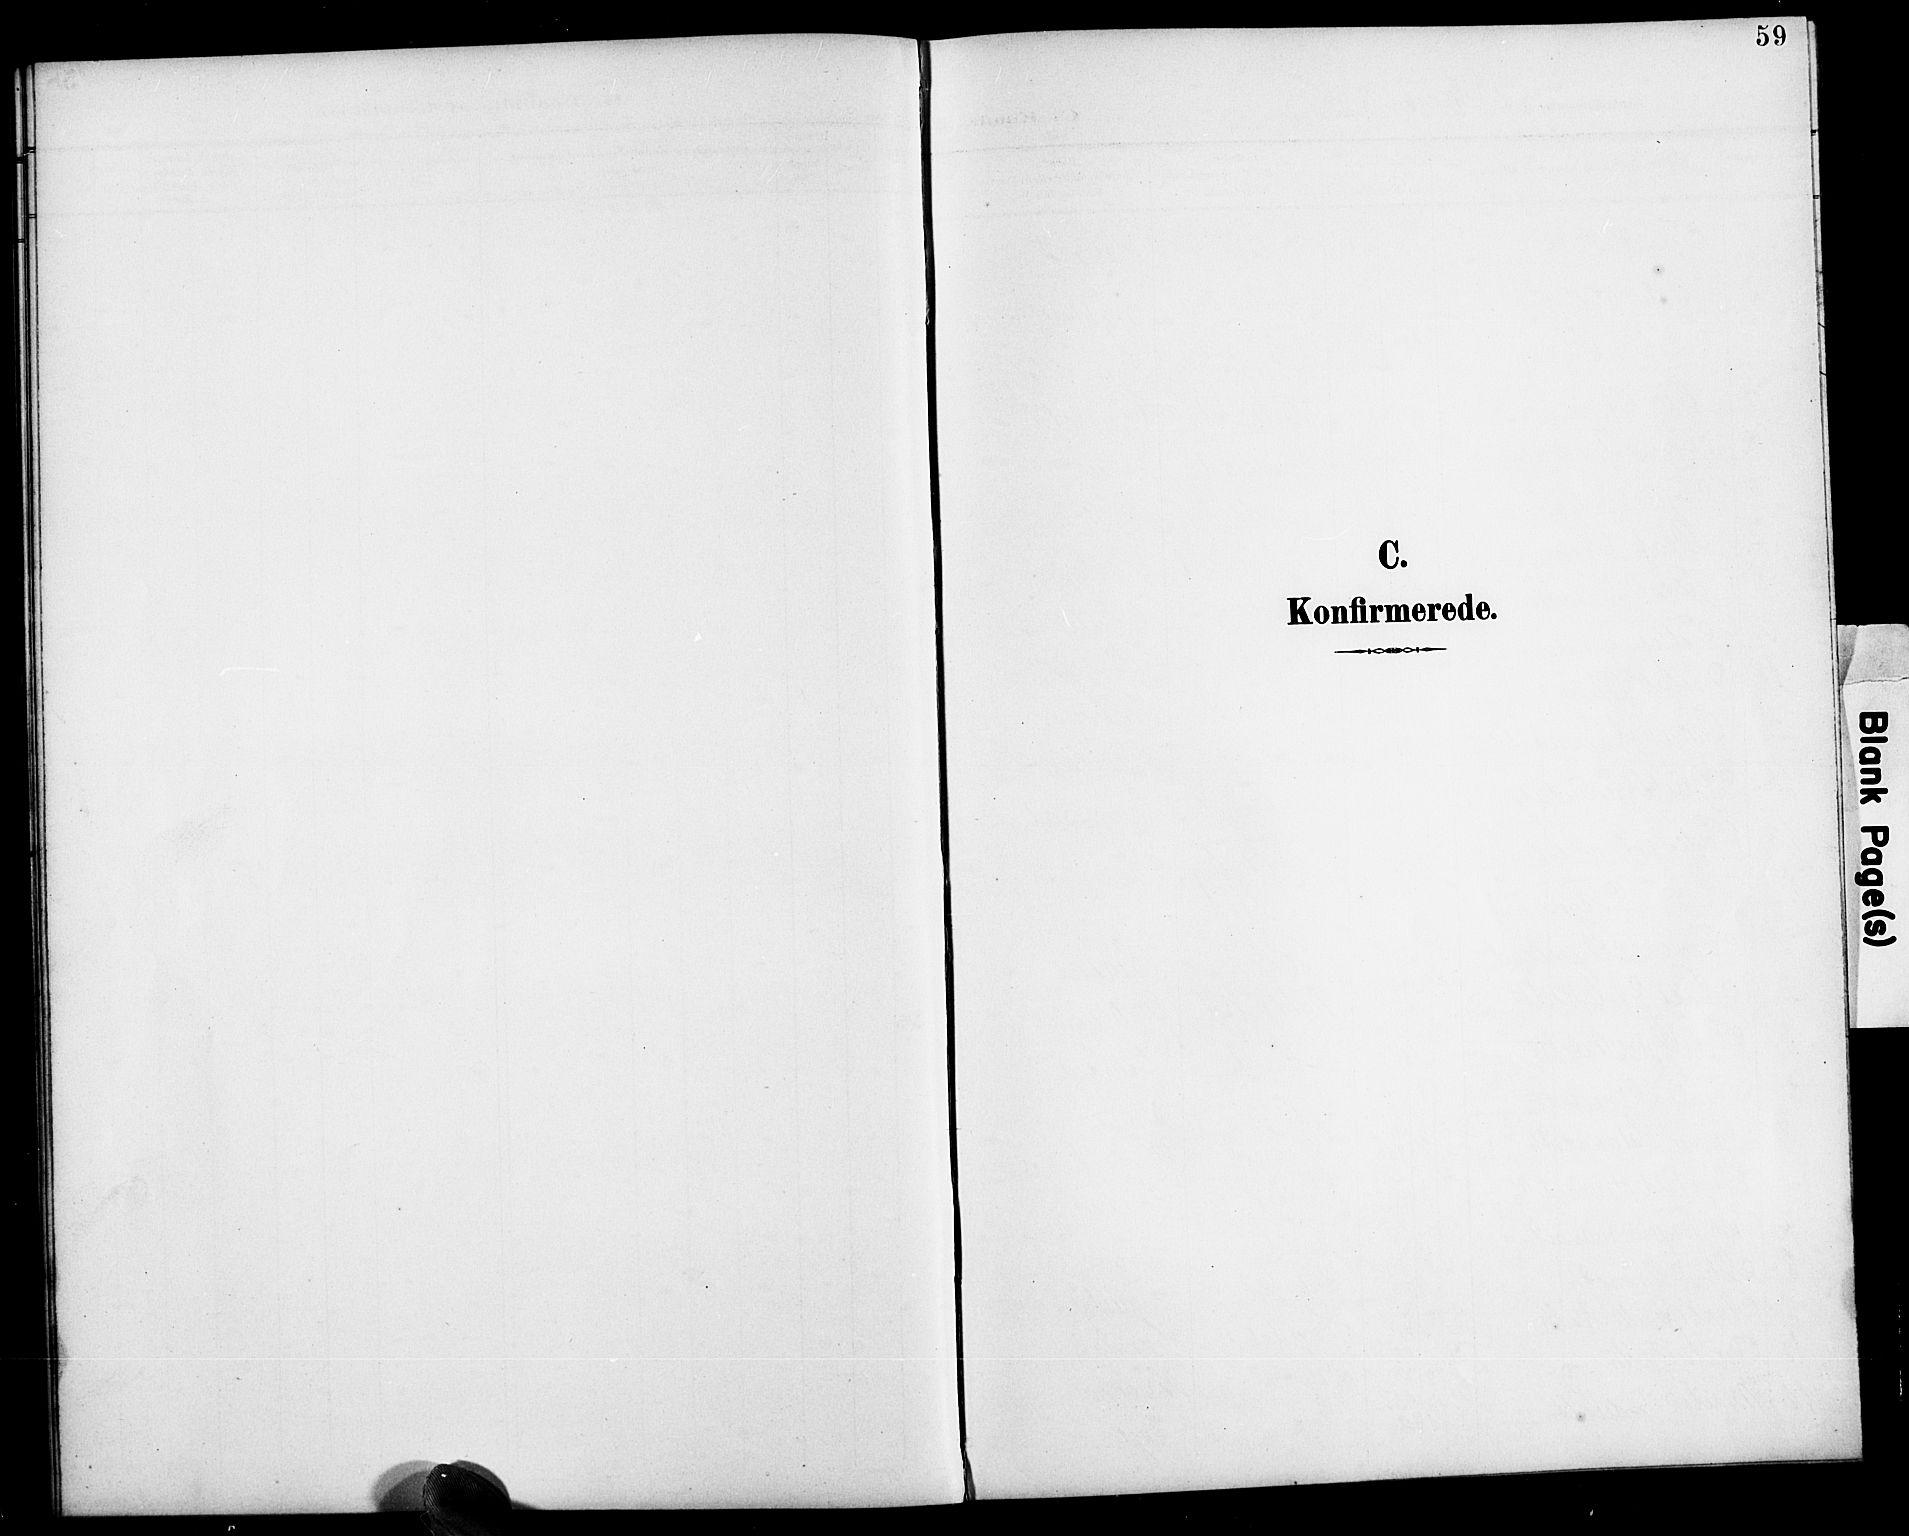 SAK, Herefoss sokneprestkontor, F/Fb/Fbb/L0003: Klokkerbok nr. B 3, 1892-1917, s. 59